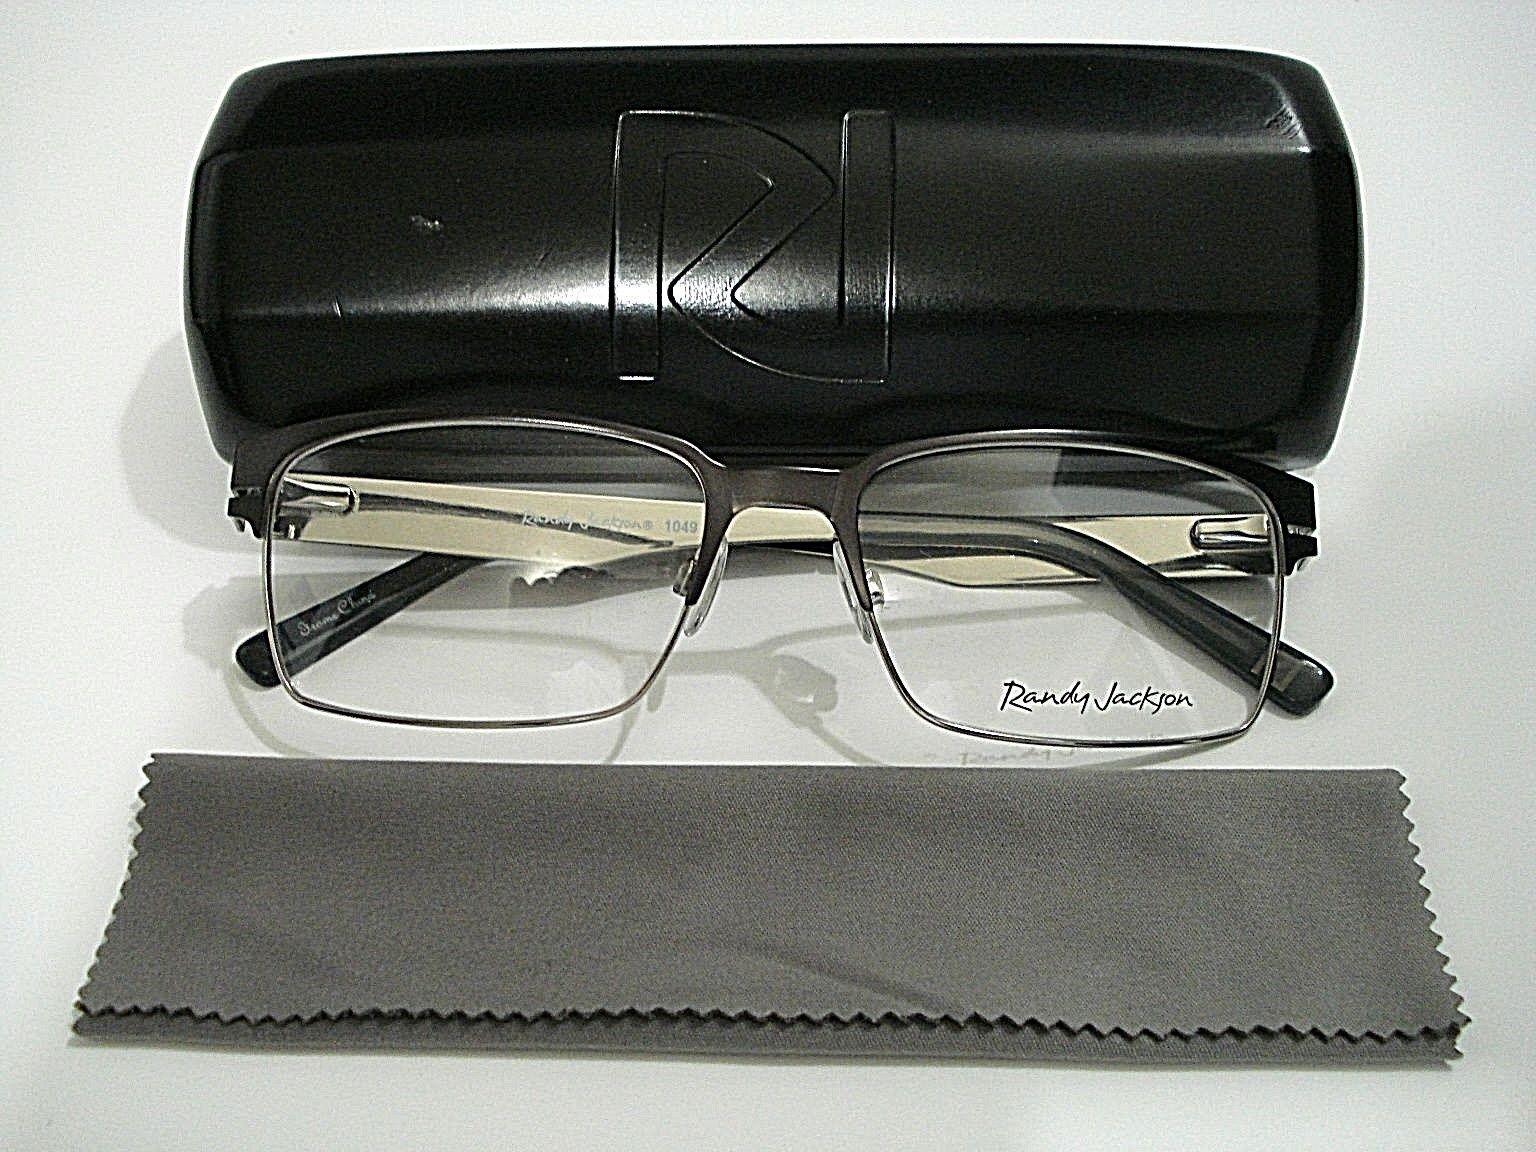 Randy Jackson RJ 1049 Rj1049 058 Gunmetal Eyeglasses Rx-able Frame ...